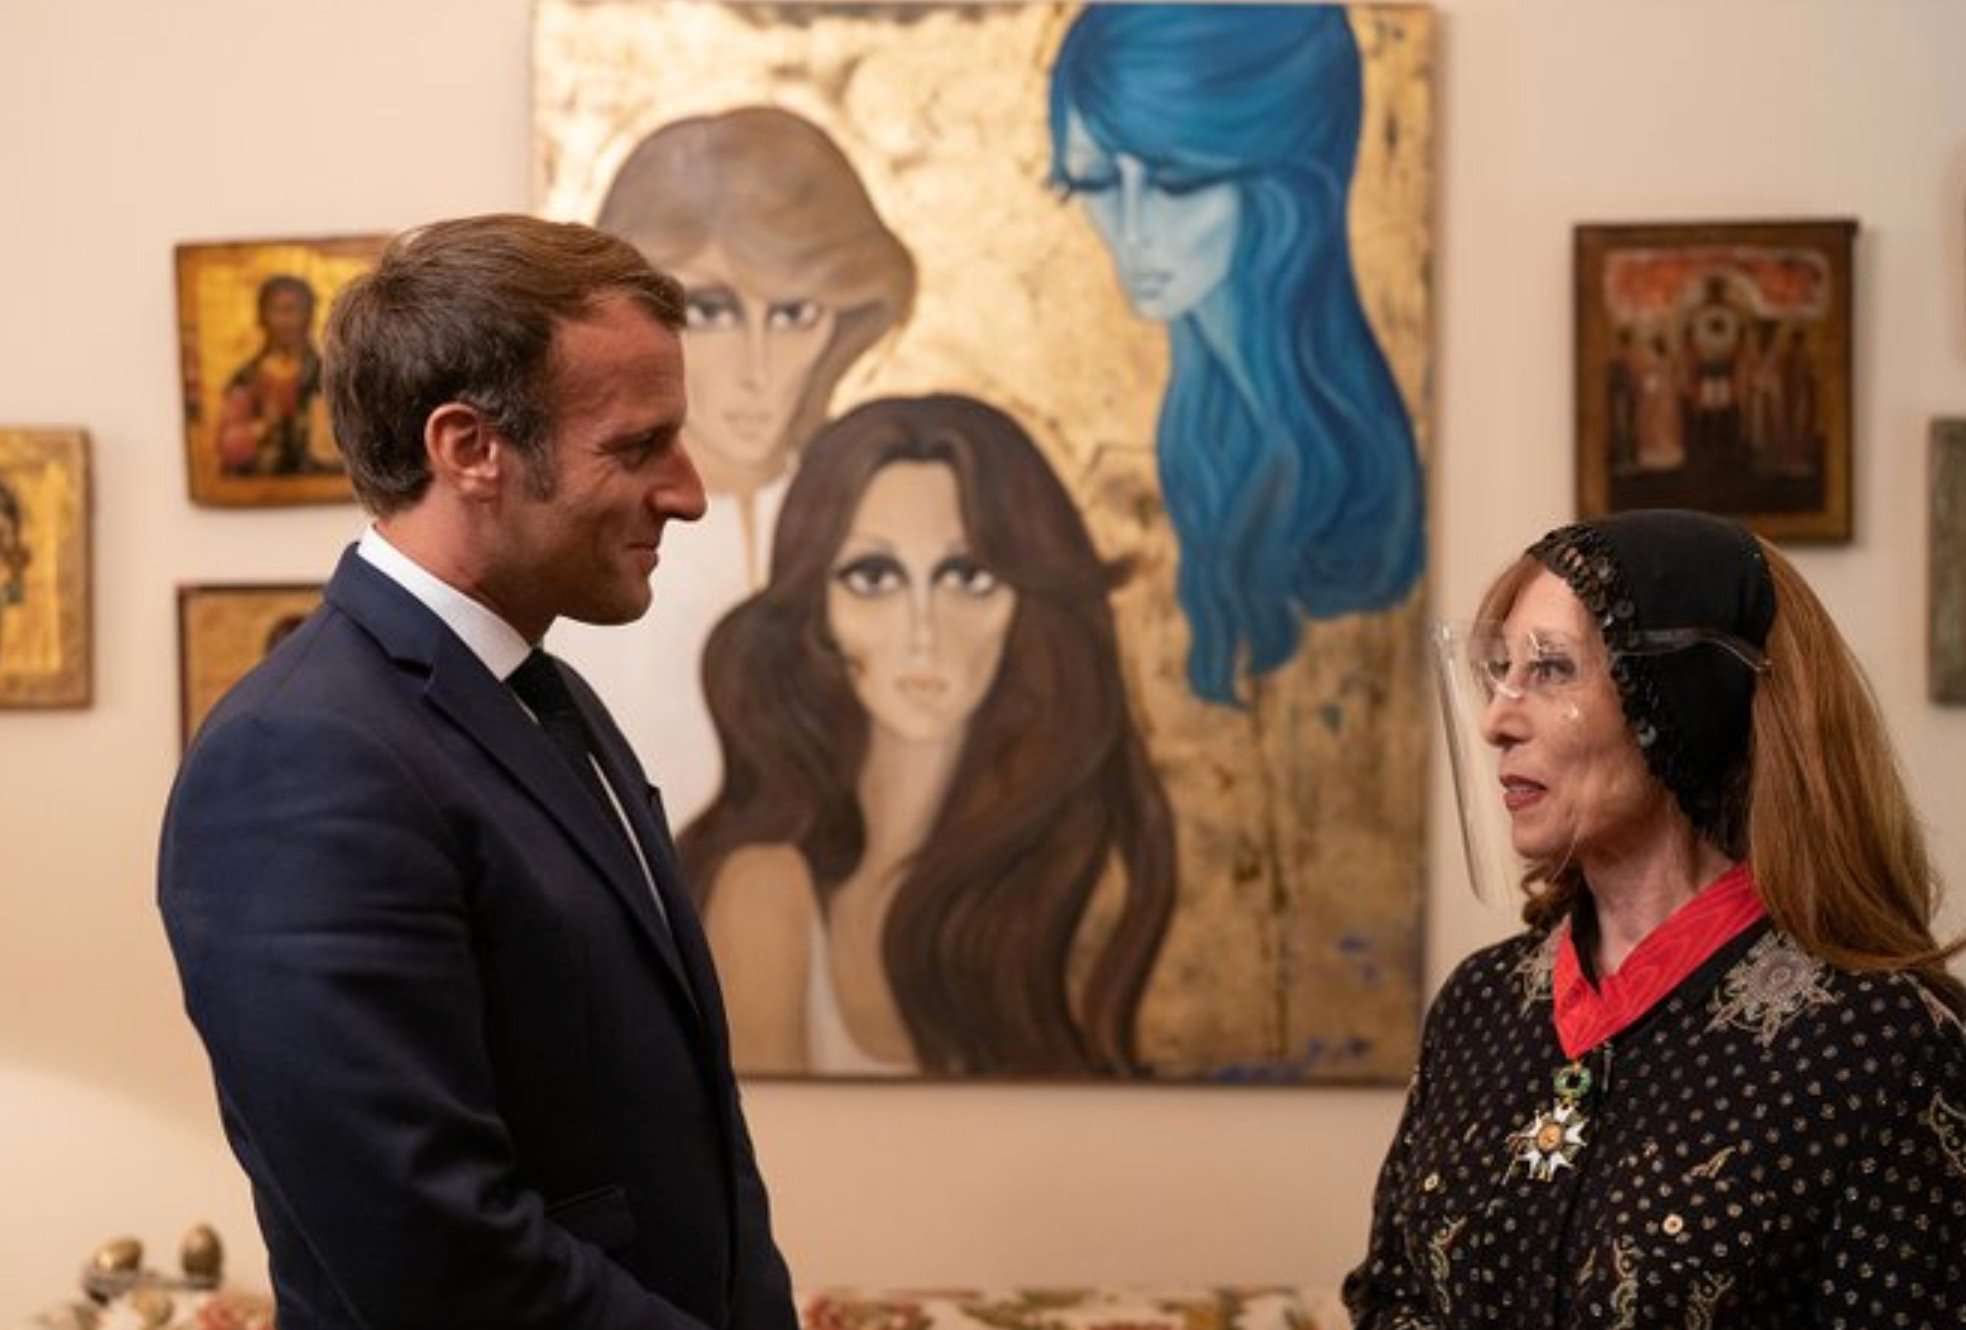 Unmasked Macron meets legendary Lebanese singer Fairuz   Middle East Eye